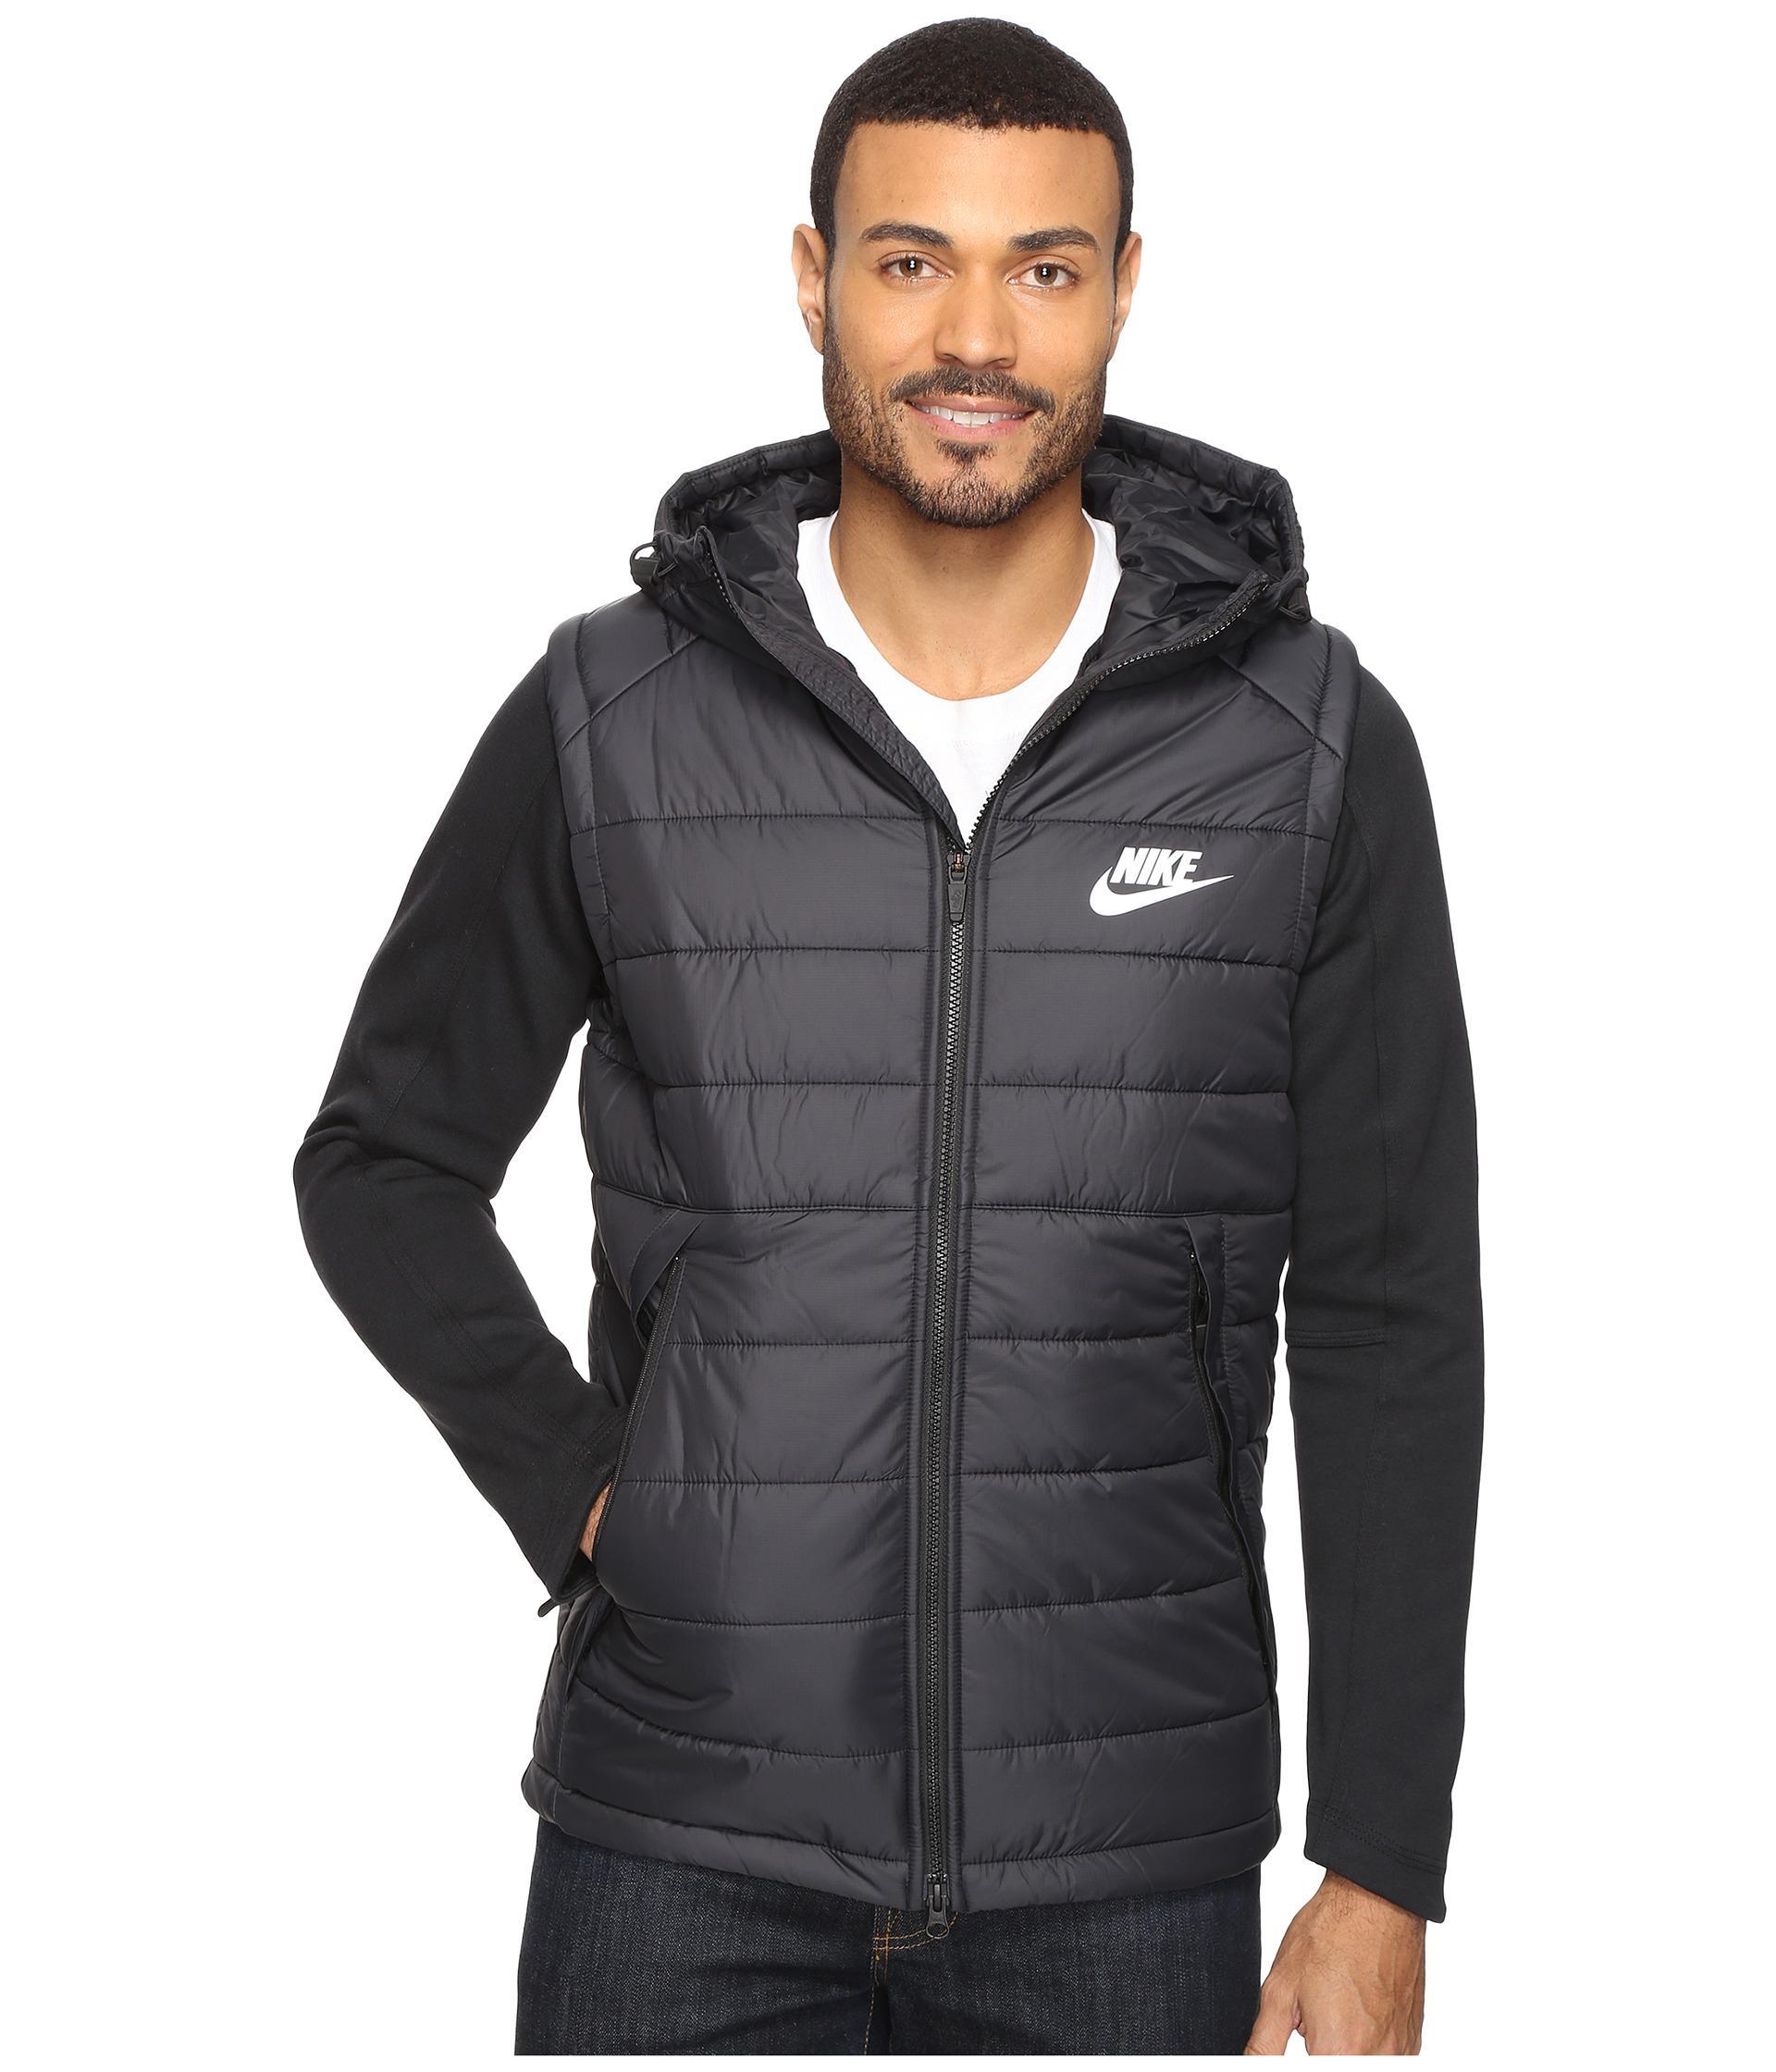 wholesale dealer new styles unique design Nsw Av15 Syn Hooded Jacket